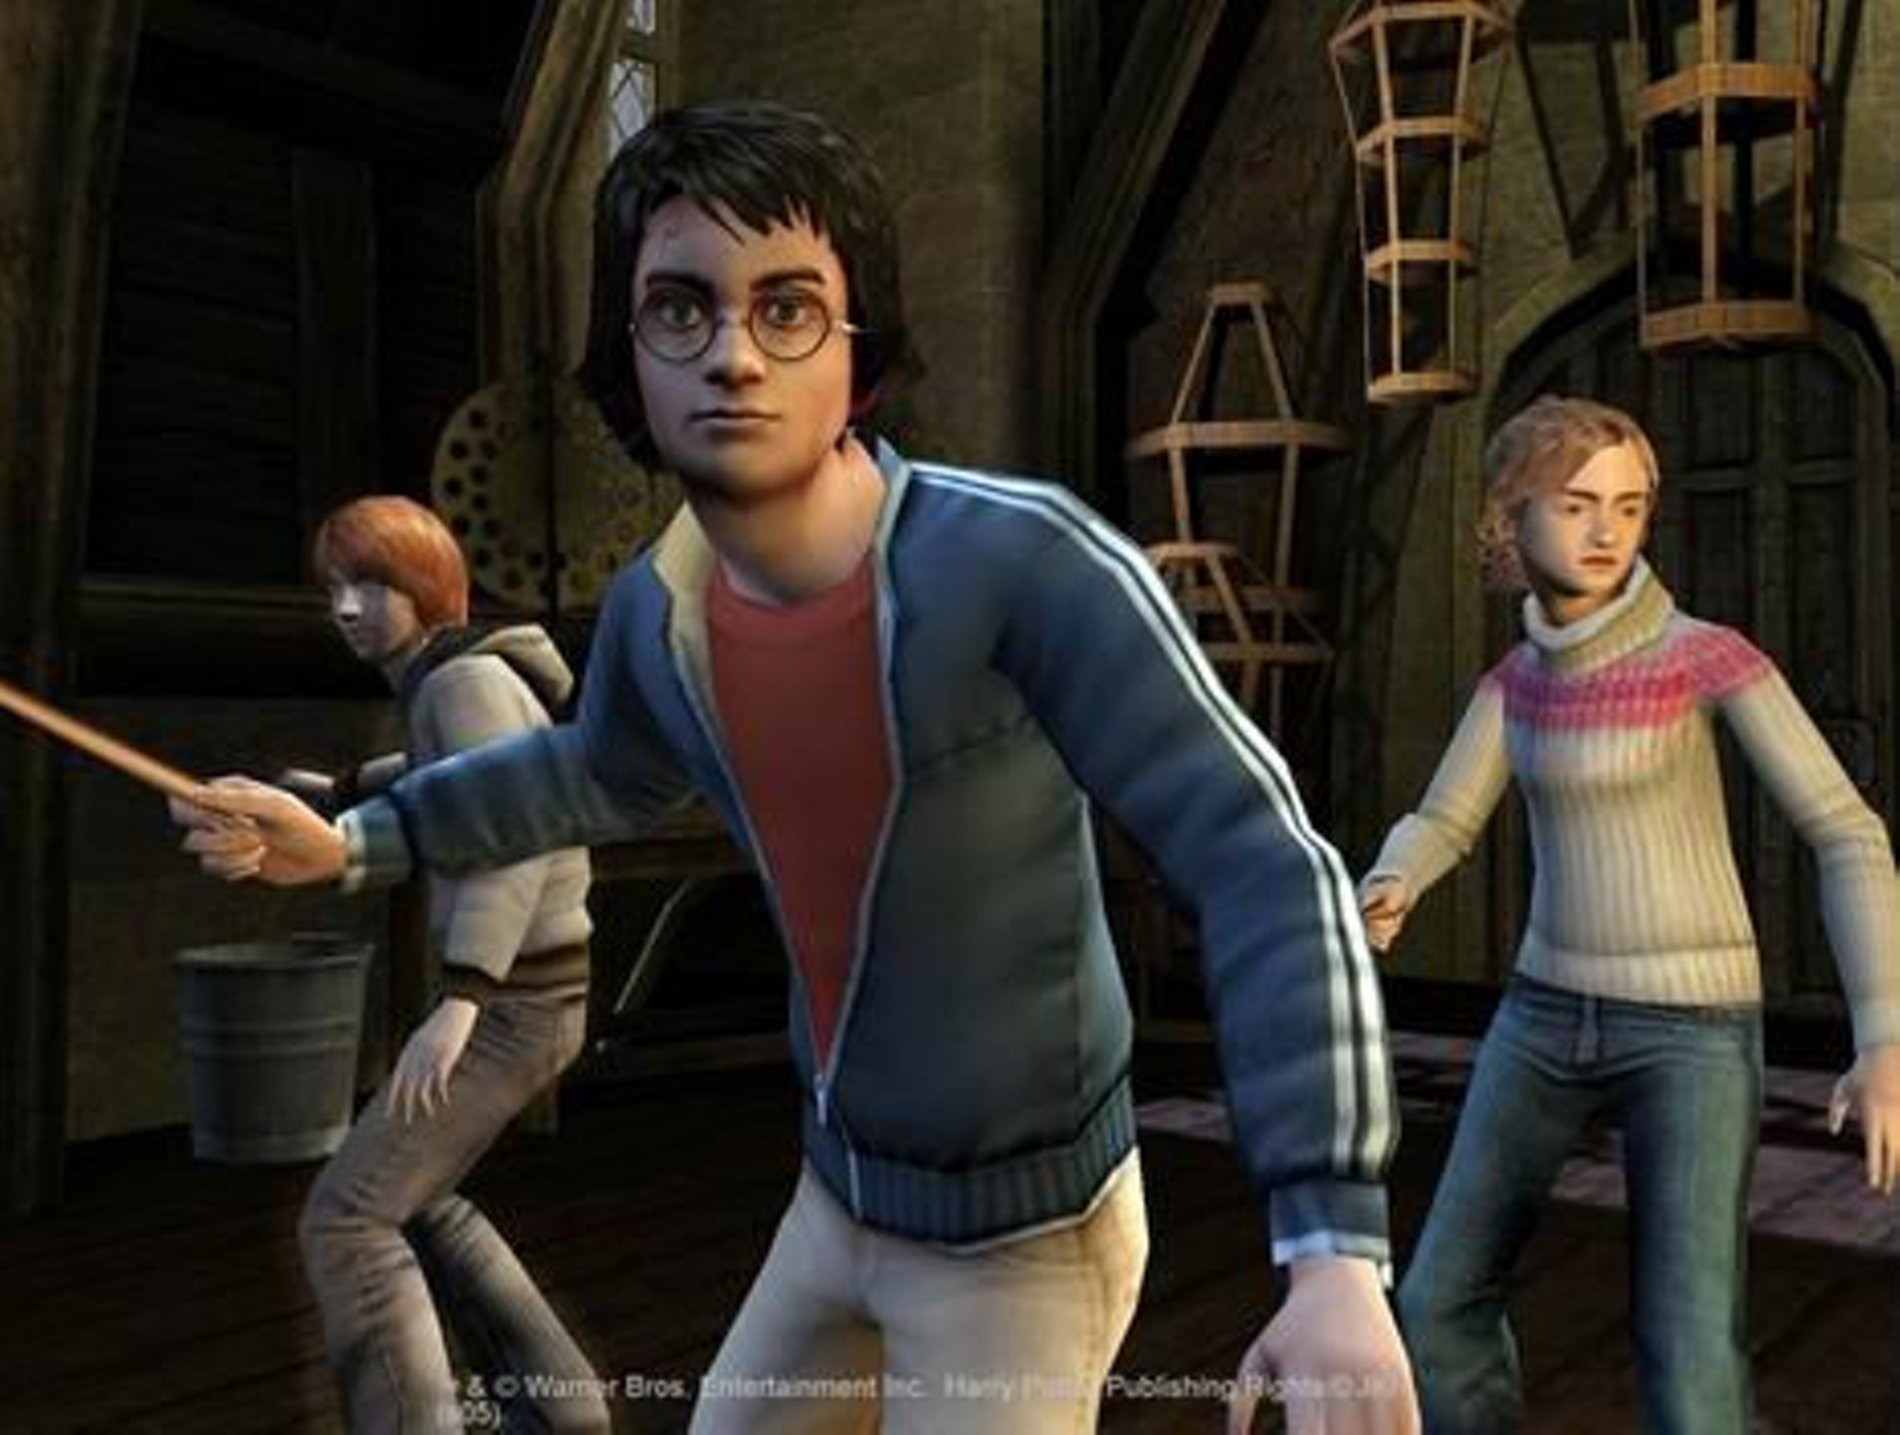 «Гарри Поттер И Тайная Комната Hd Смотреть Онлайн» / 2003